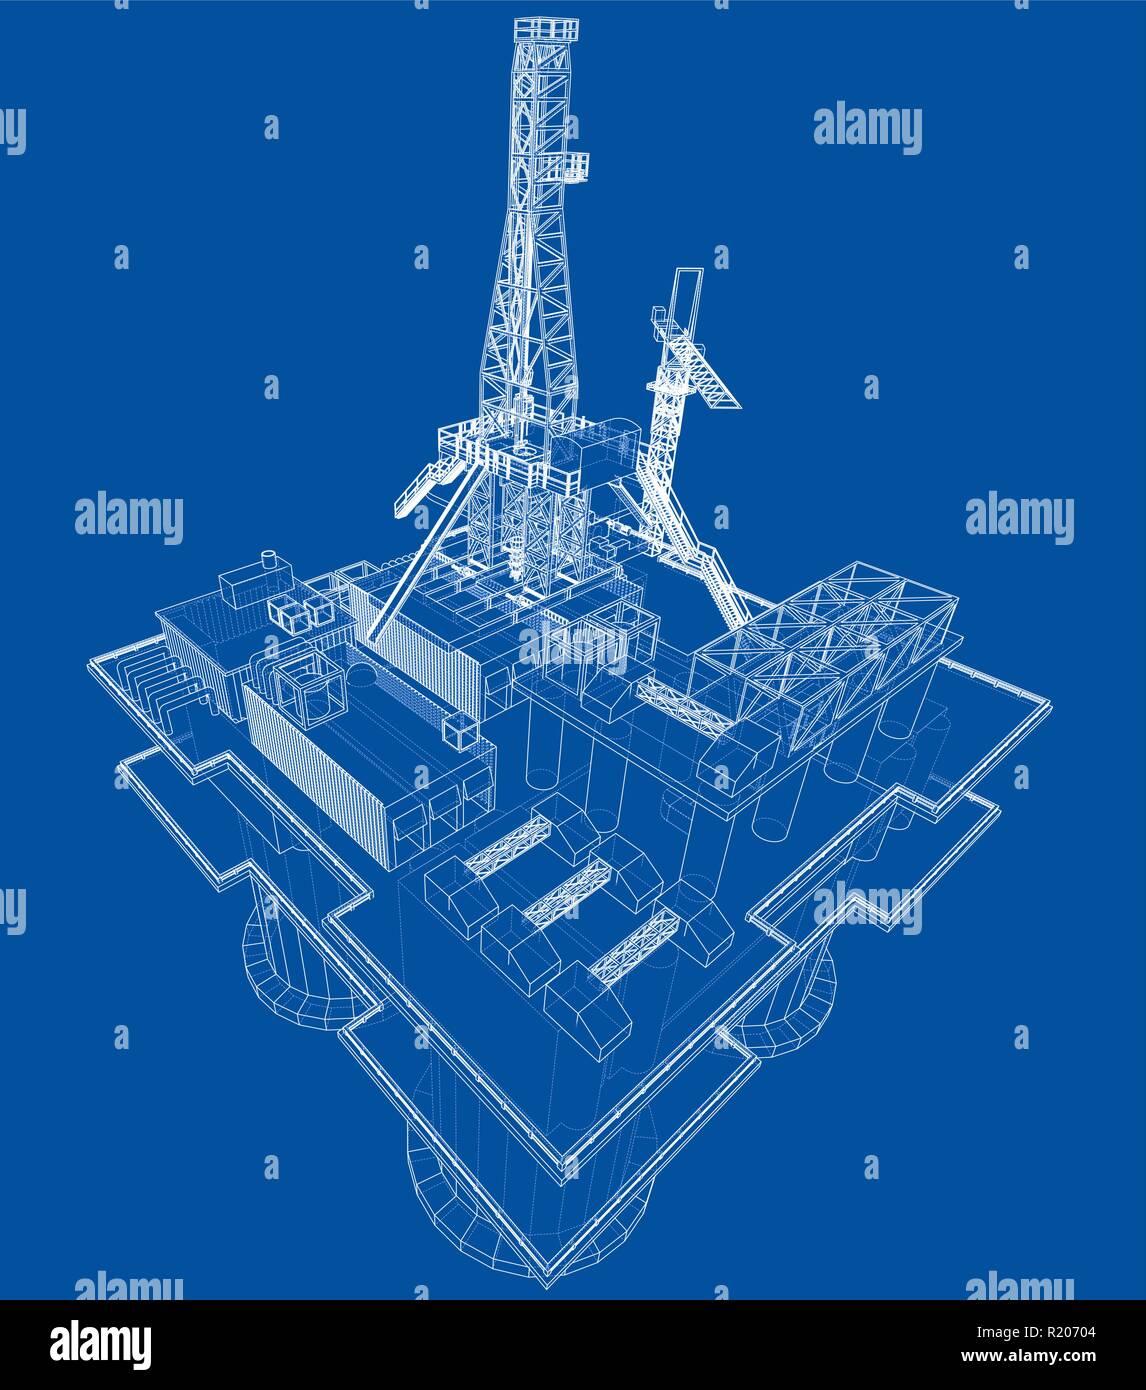 Offs oil rig drilling platform concept. Vector Stock ... Ocean Drilling Rig Schematic Diagram on